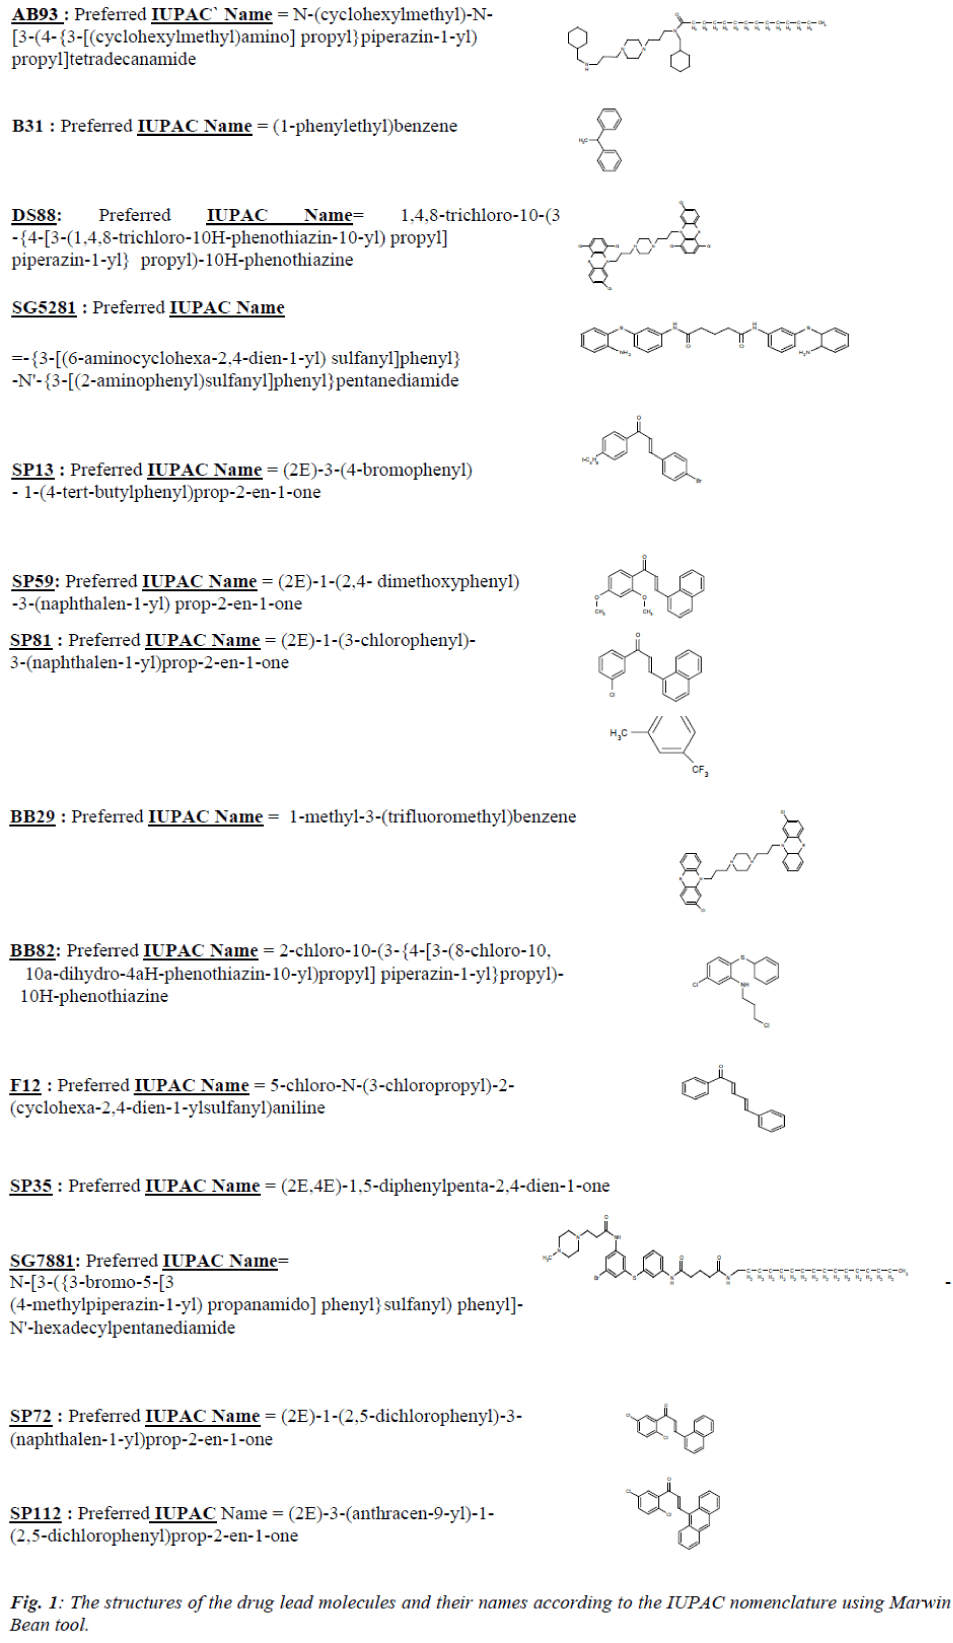 biomedres-structures-drug-lead-molecules